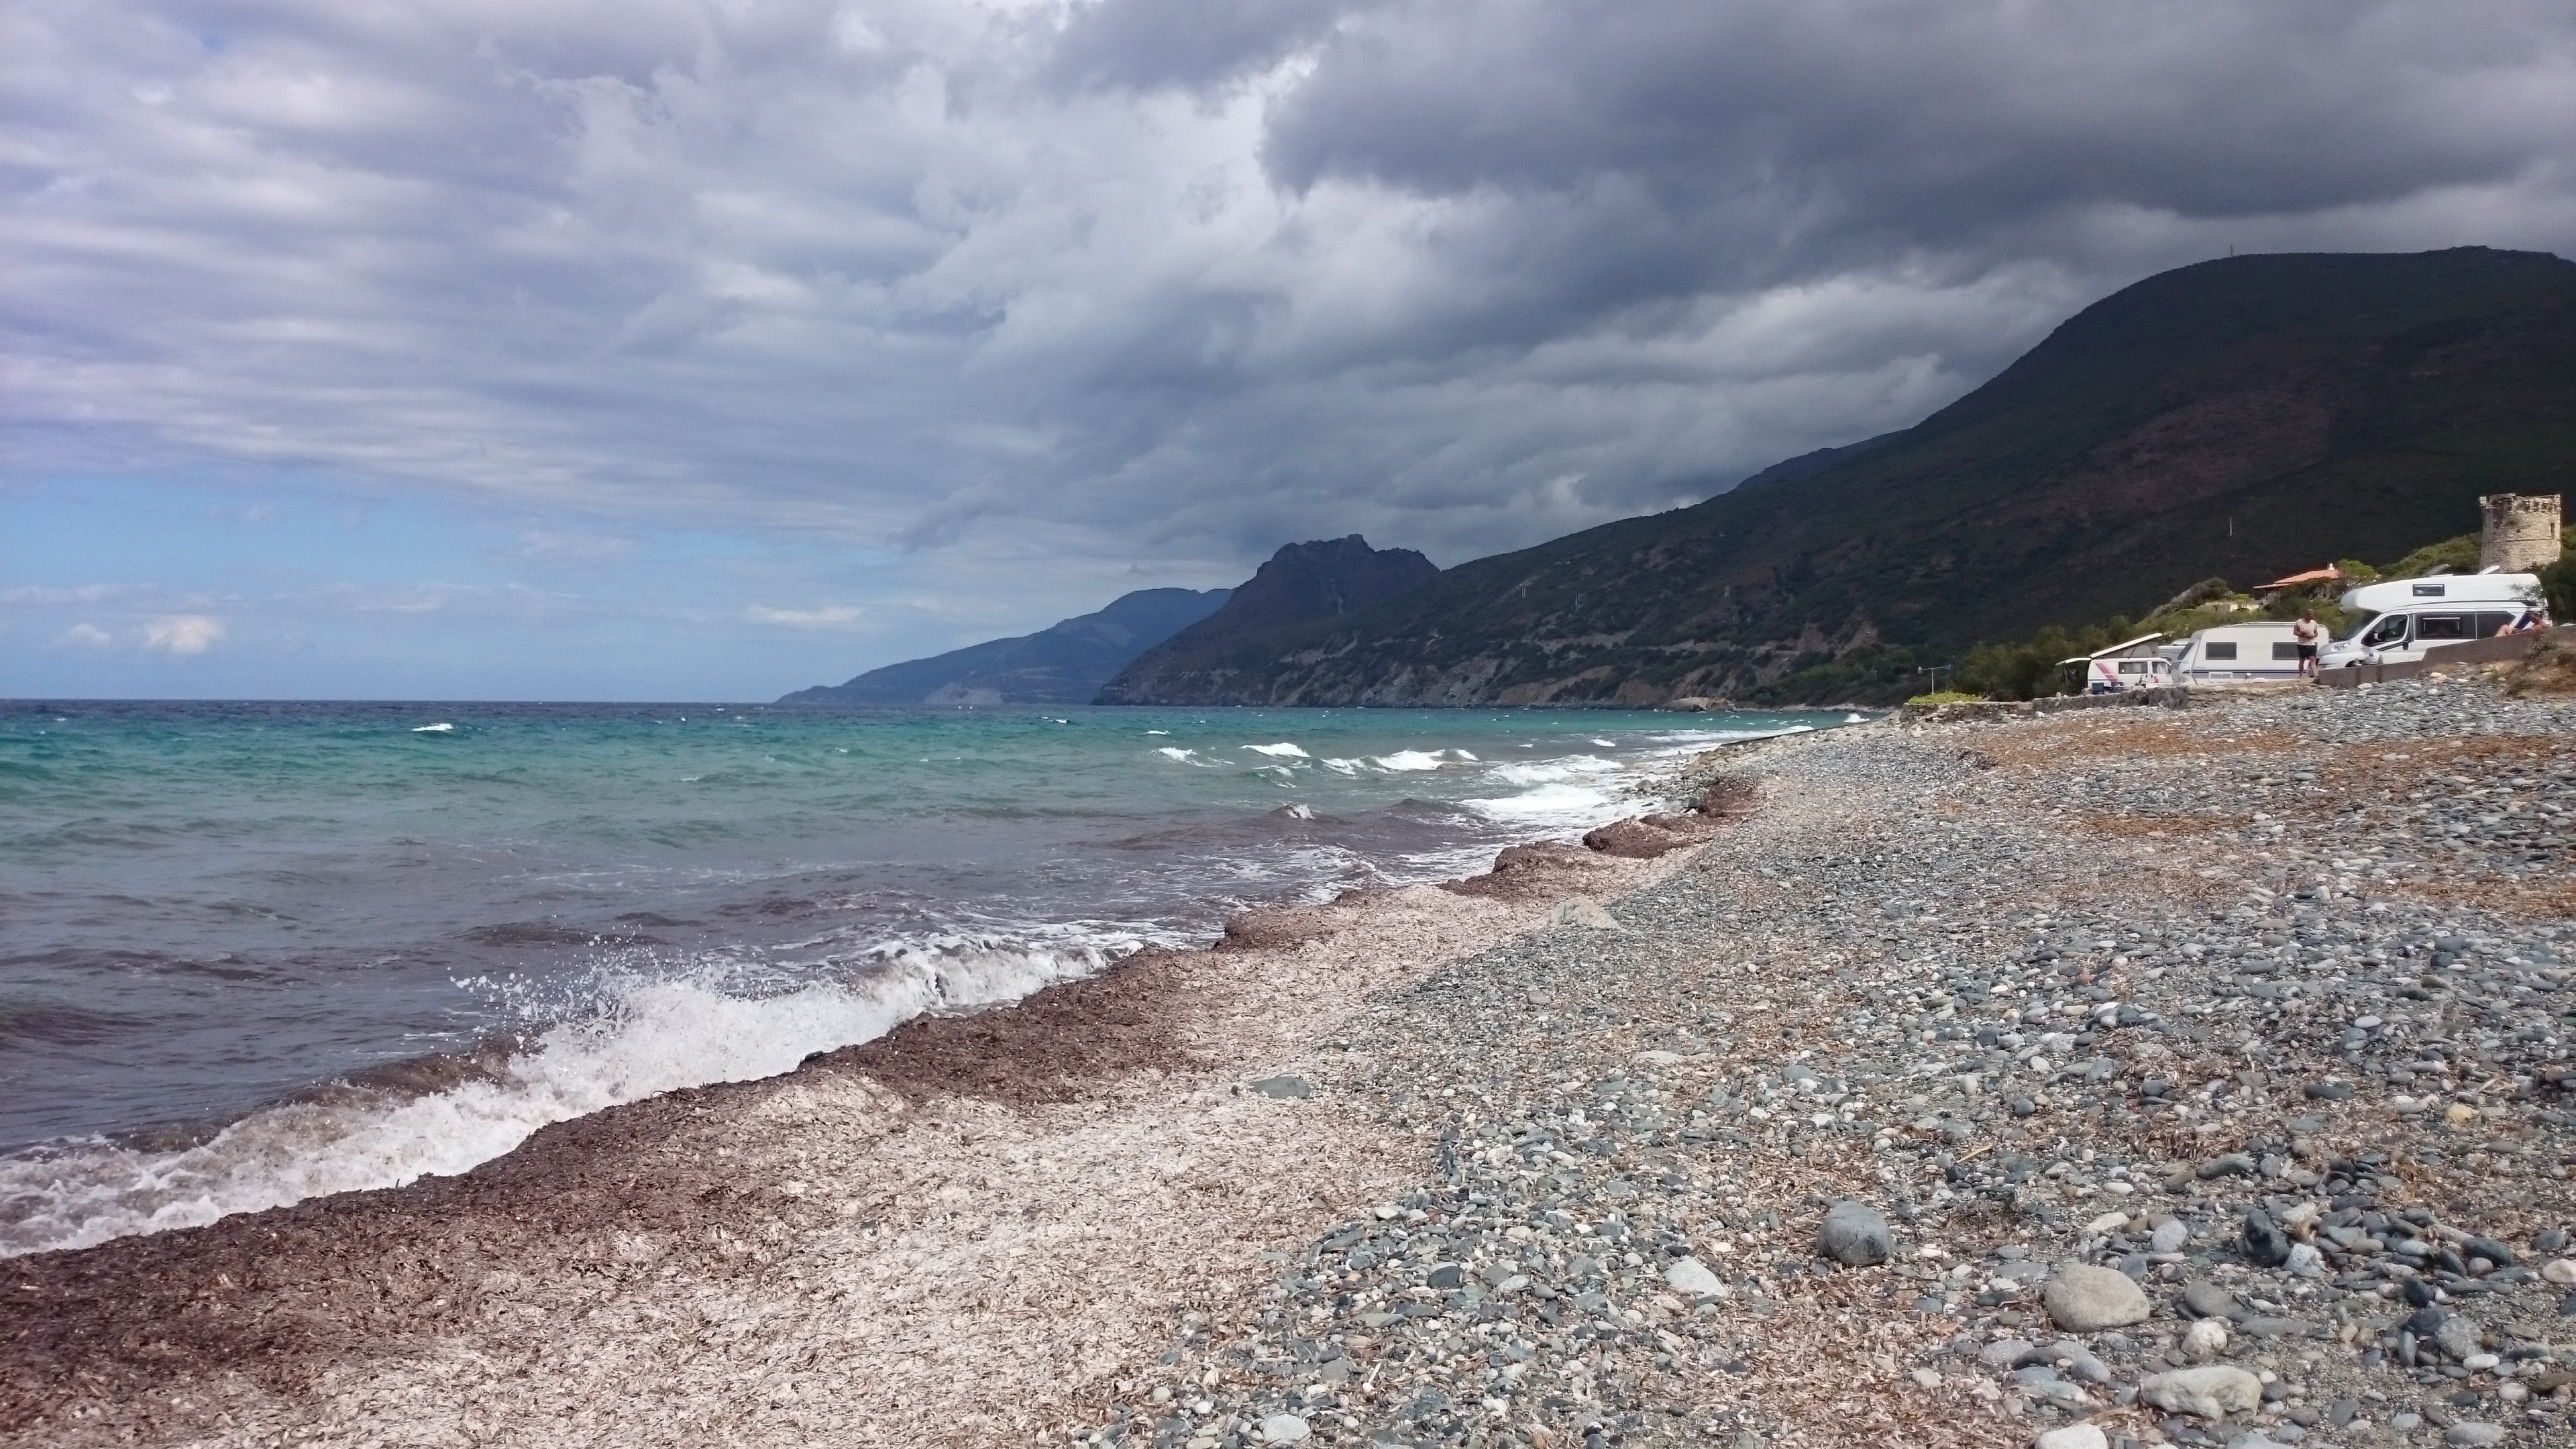 Sturm am Cap Corse Korsika